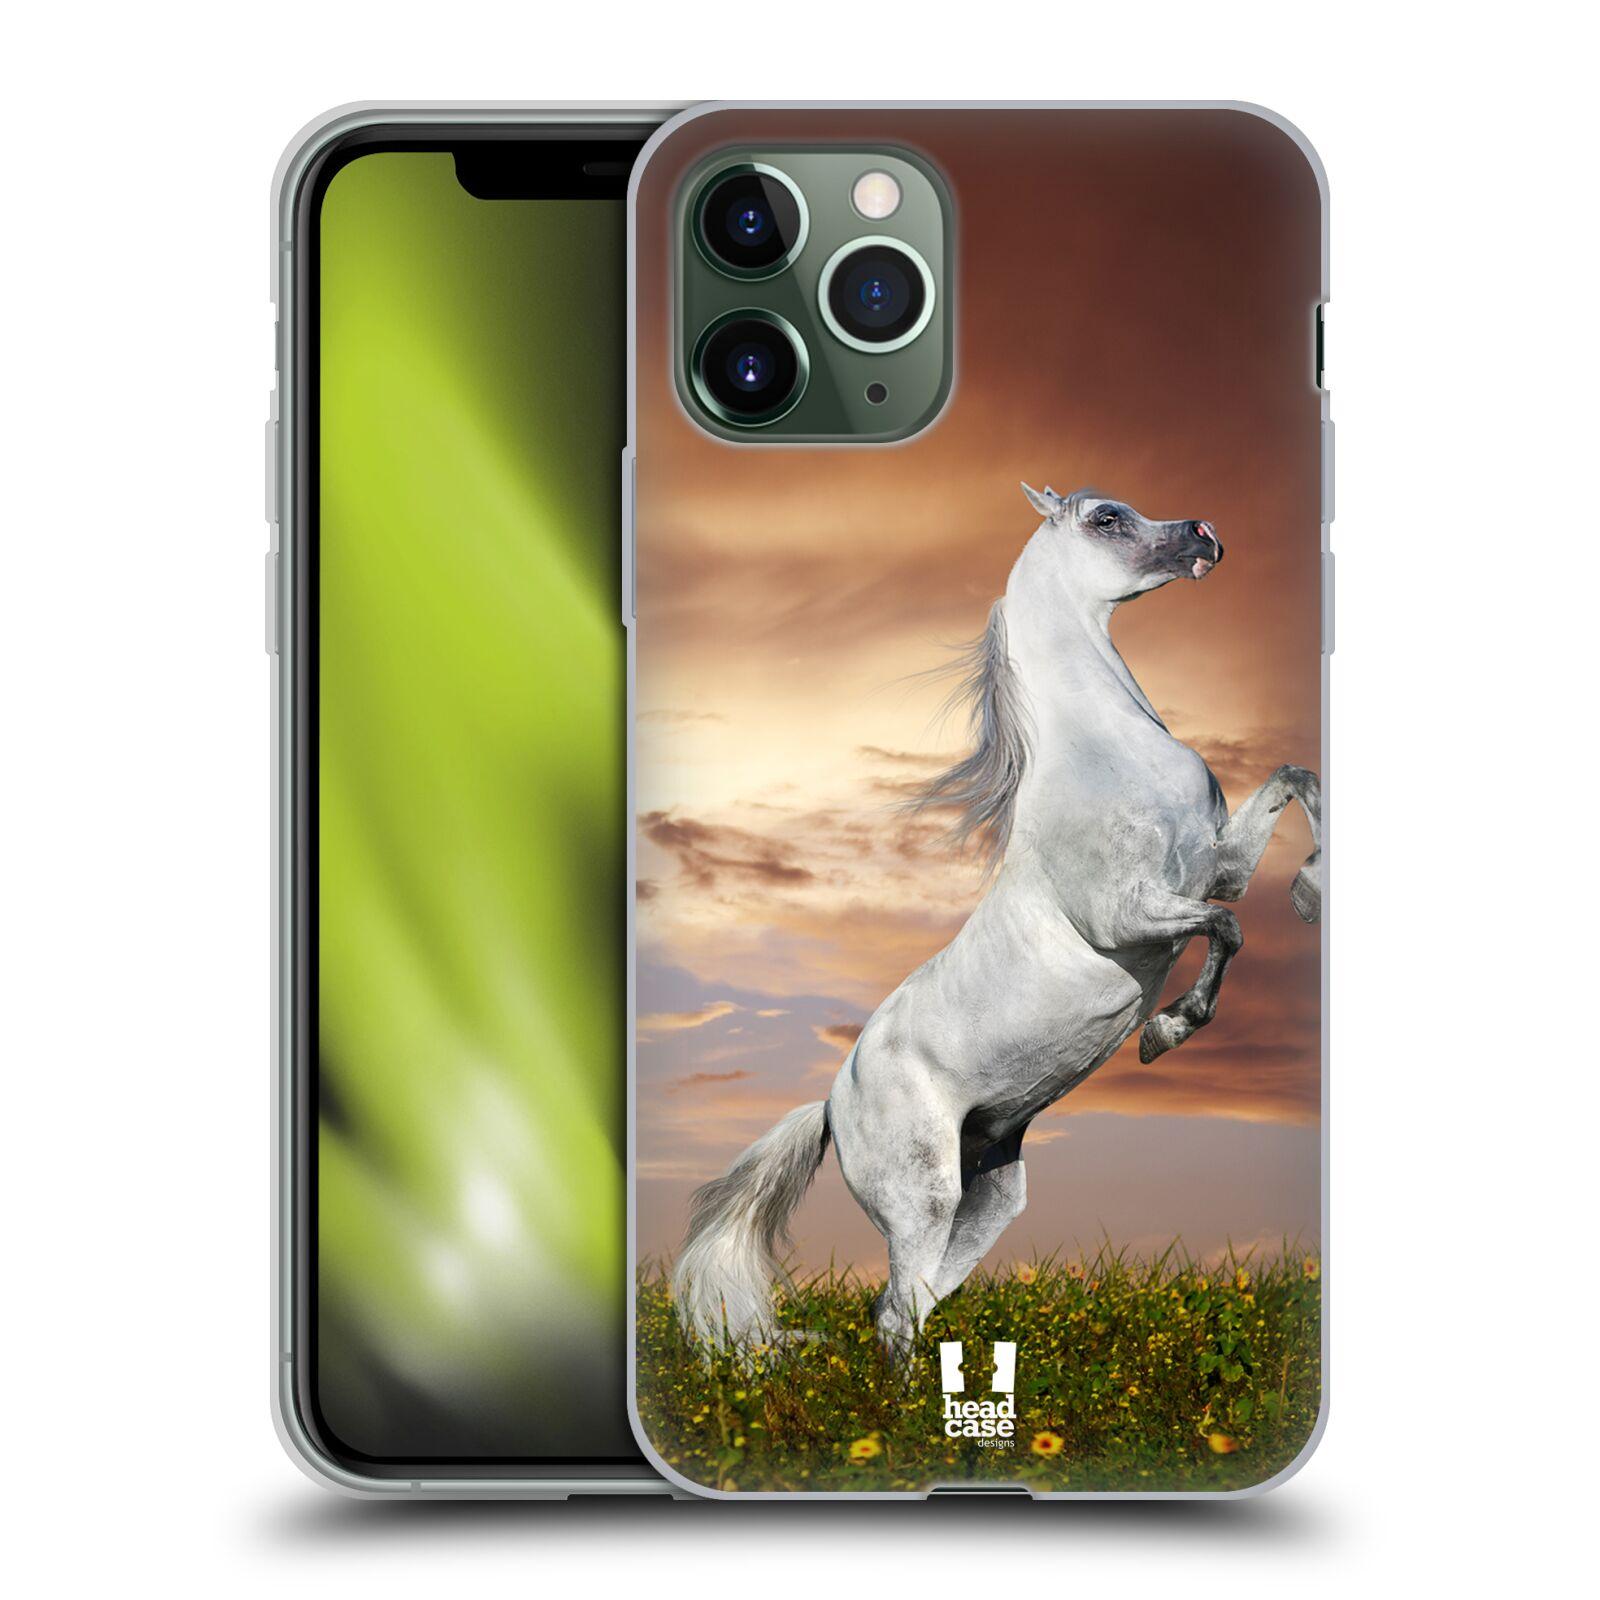 silikonový krytu na iphone 8 plus | Silikonové pouzdro na mobil Apple iPhone 11 Pro - Head Case - DIVOČINA – KŮŇ